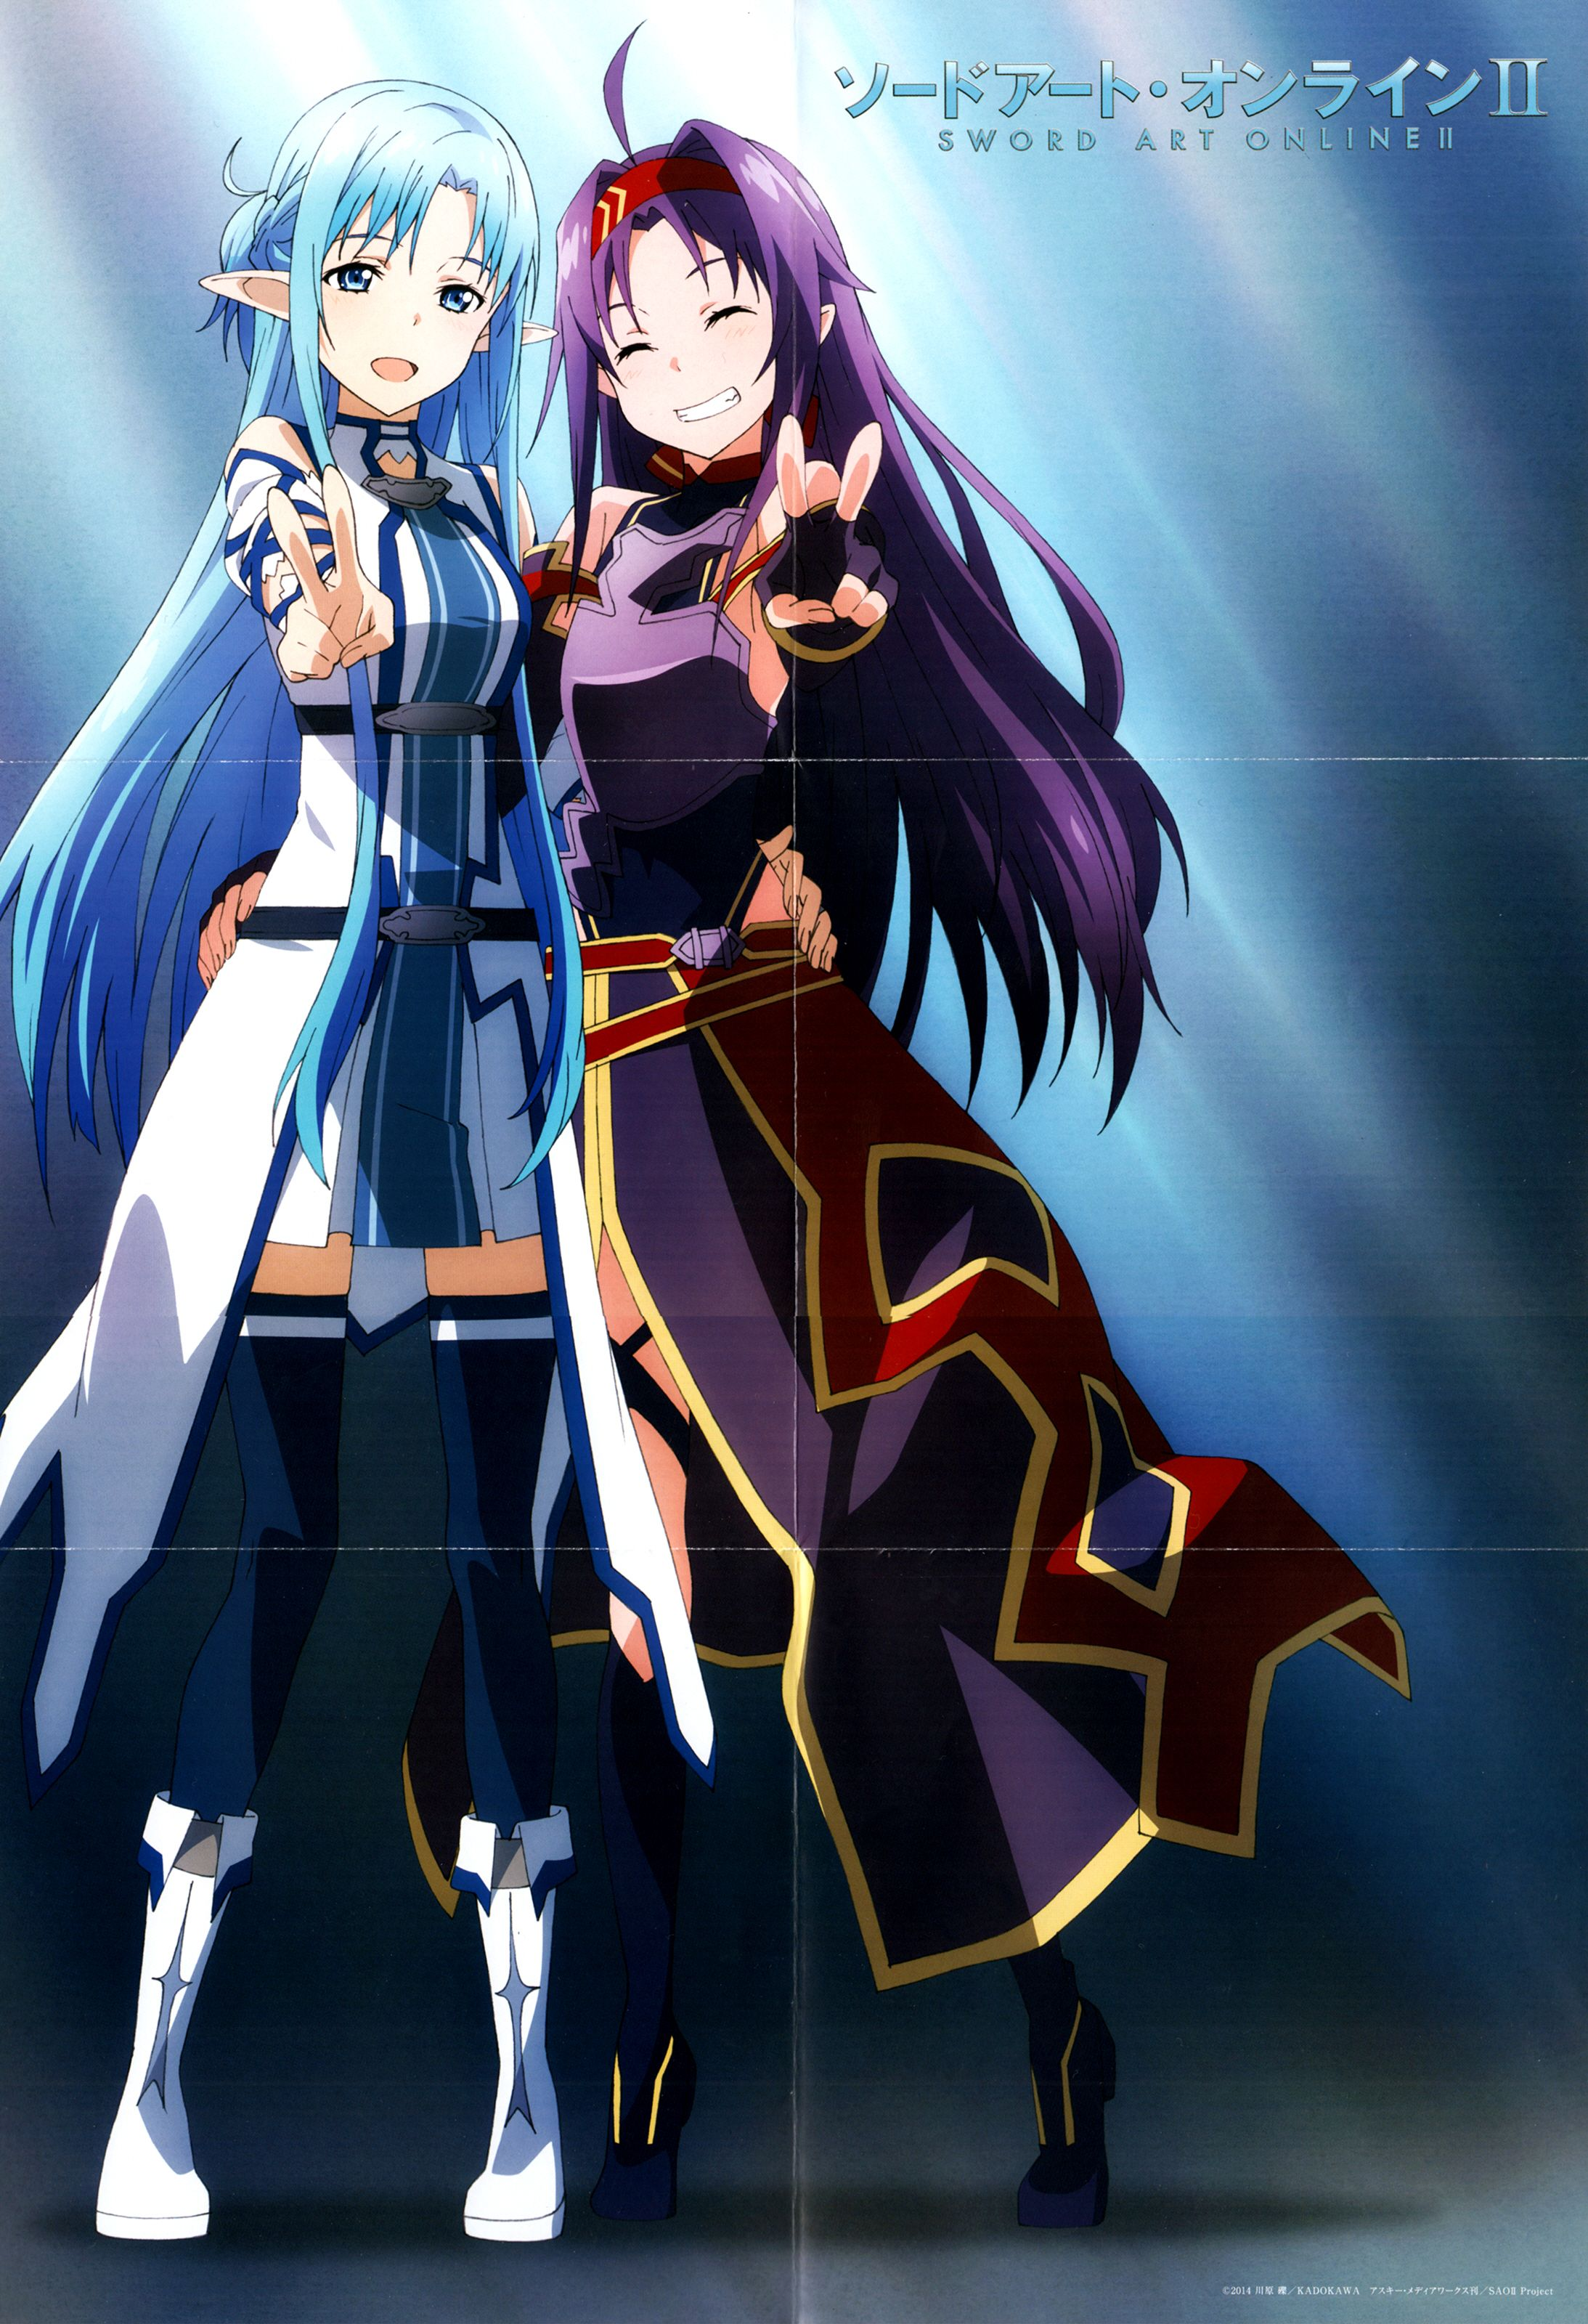 asuna and yuuki - sword art online | asuna yuuki | pinterest | sword